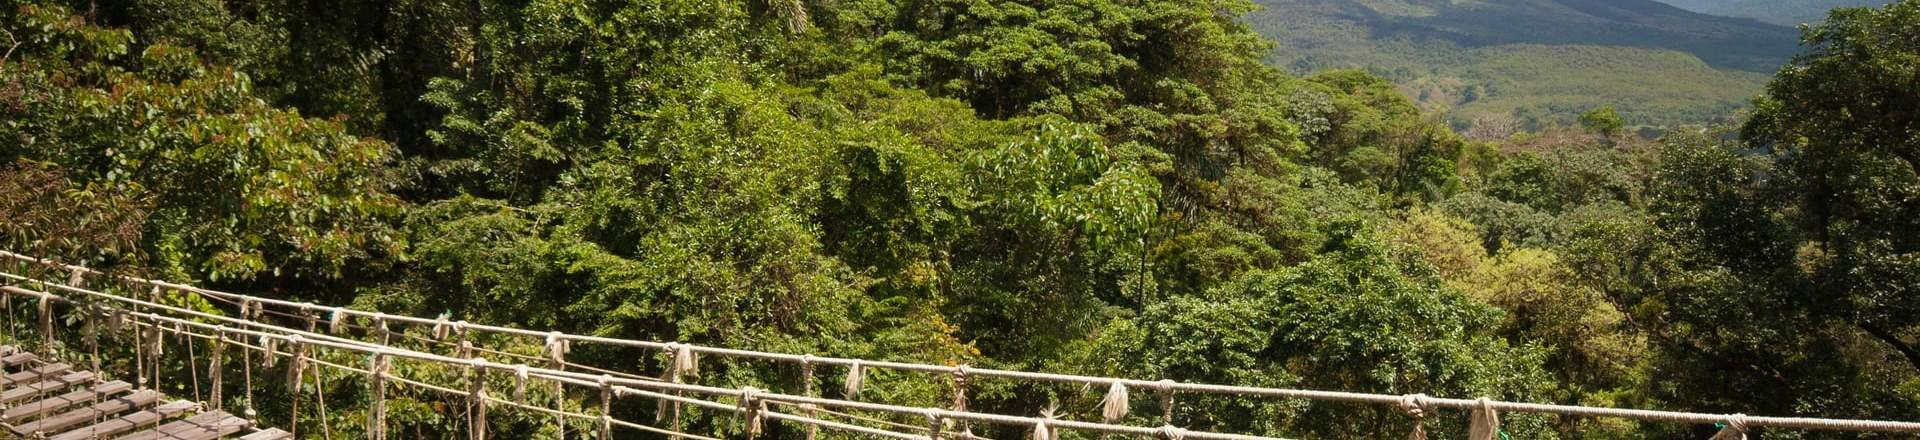 Aventura En Costa Rica Rafting Termas Tirolinas Y Playas